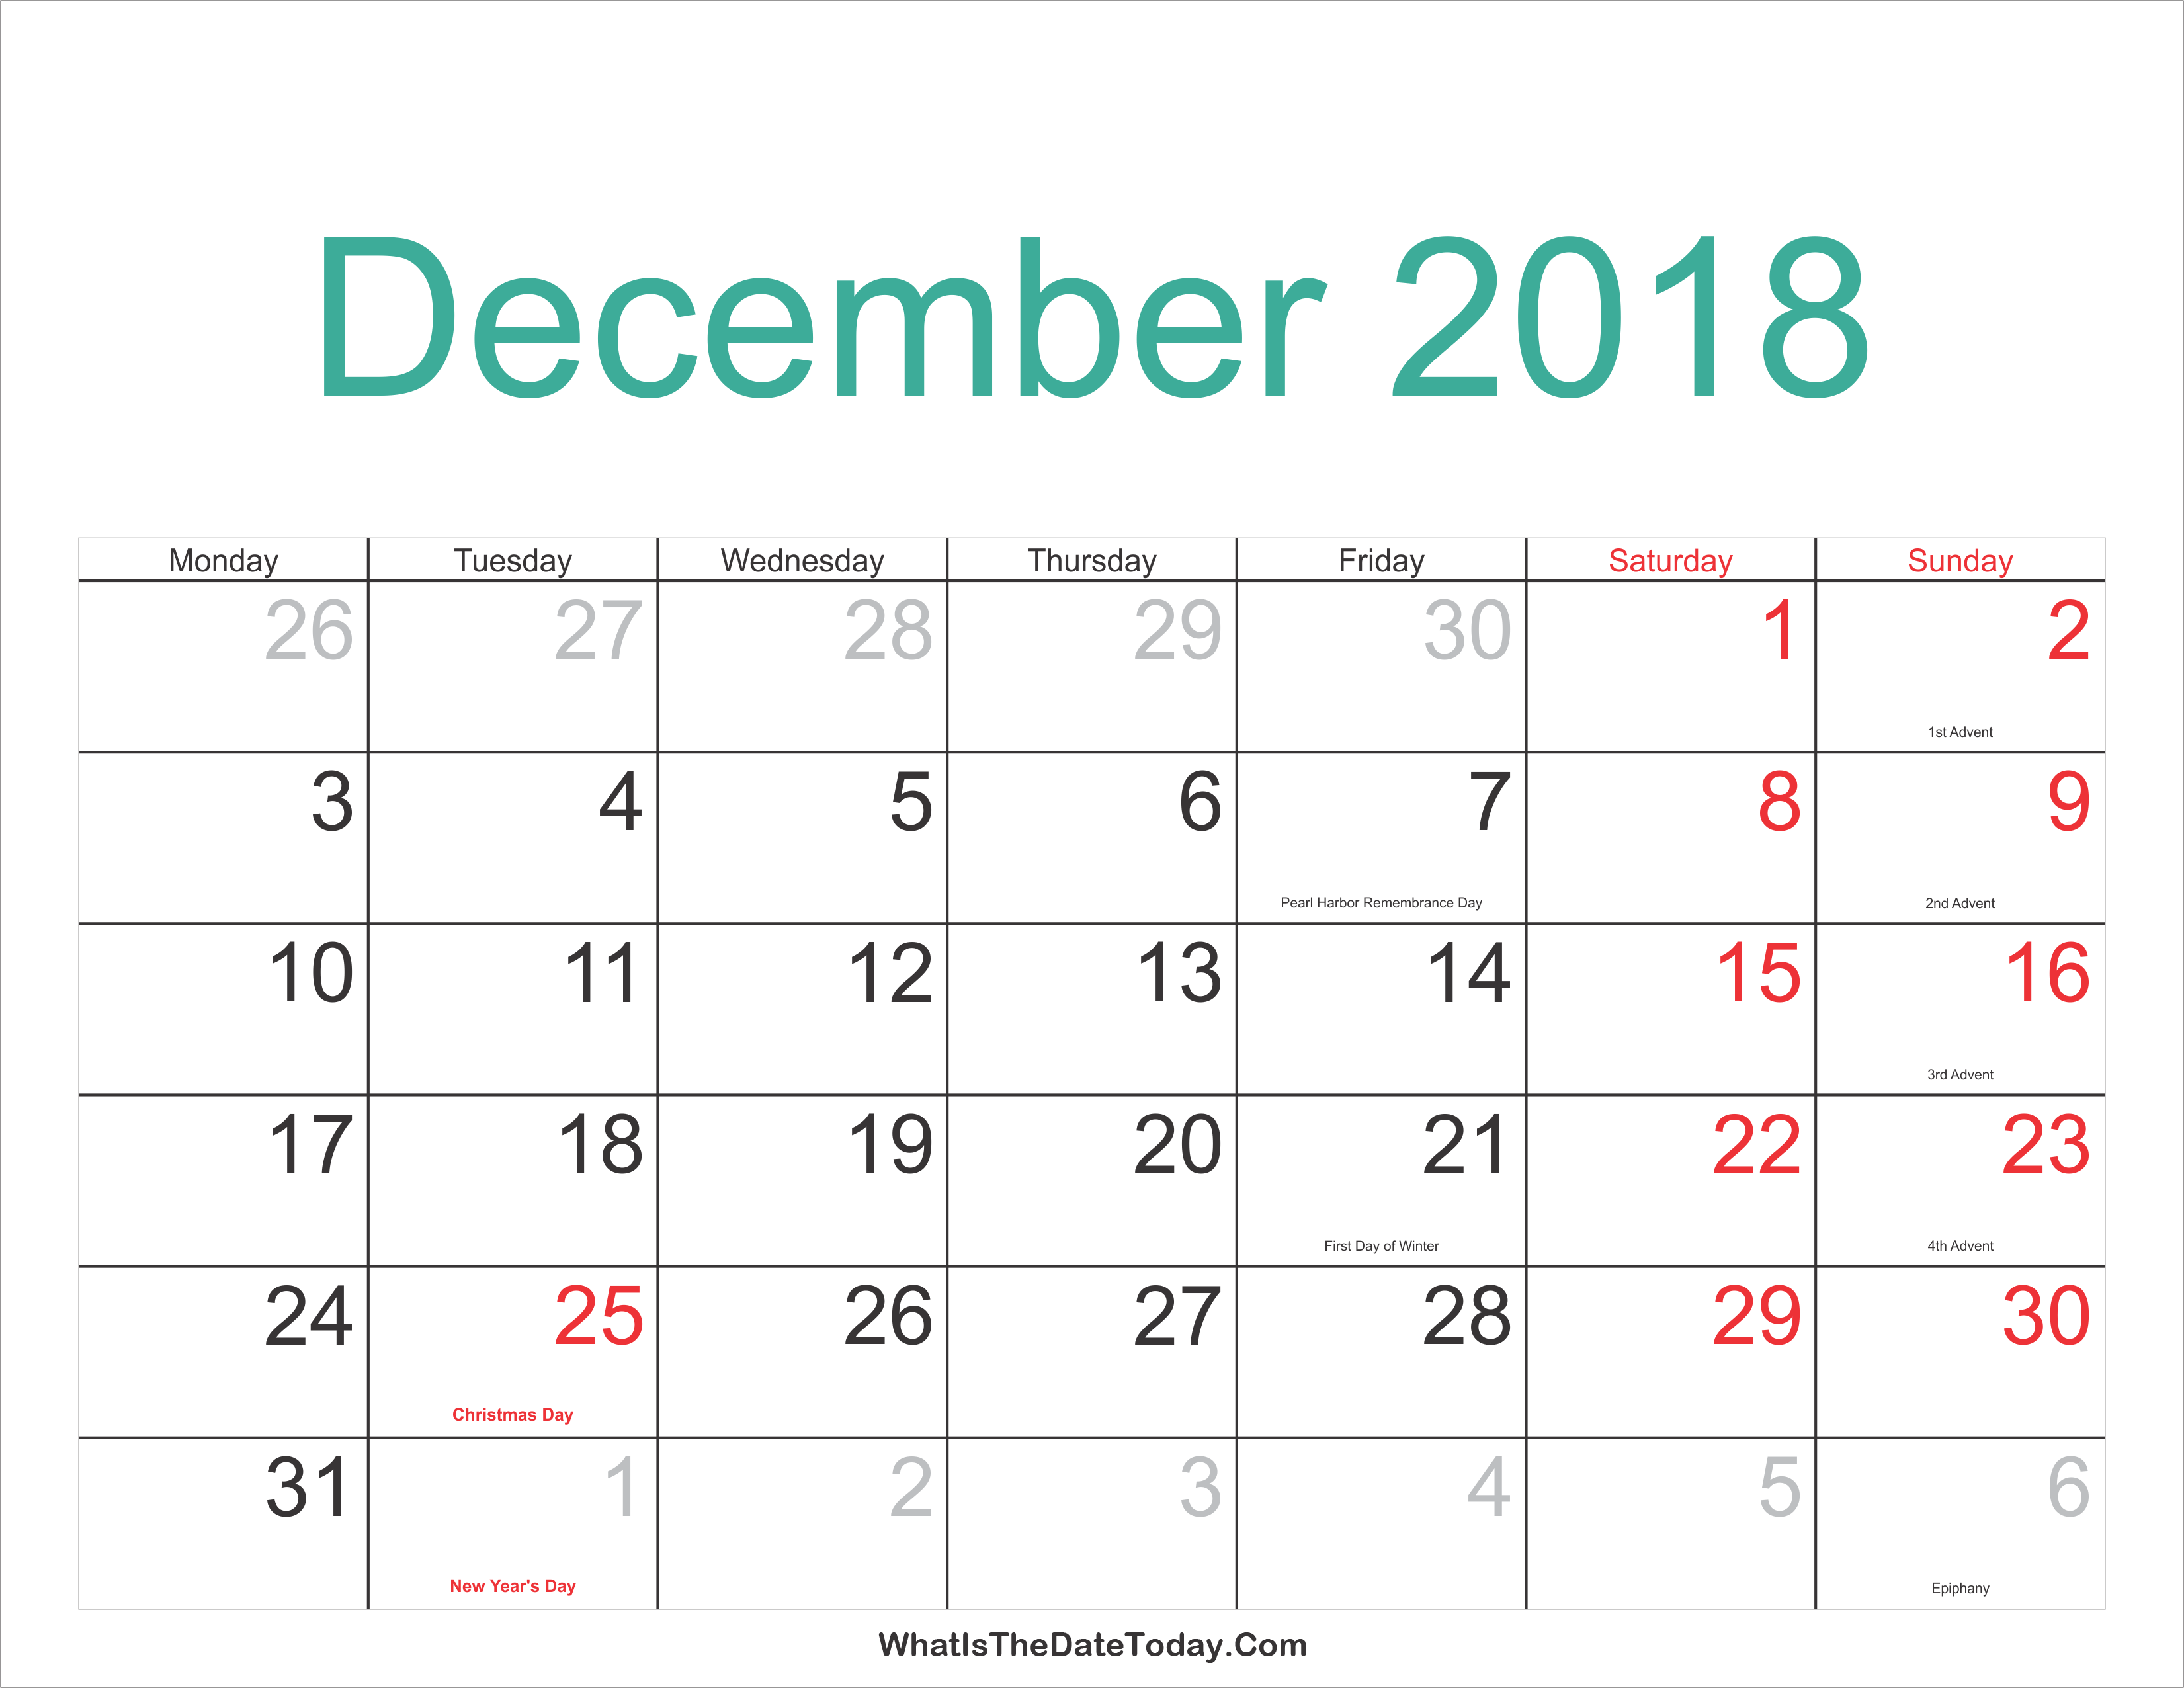 dec 2018 calendar printable